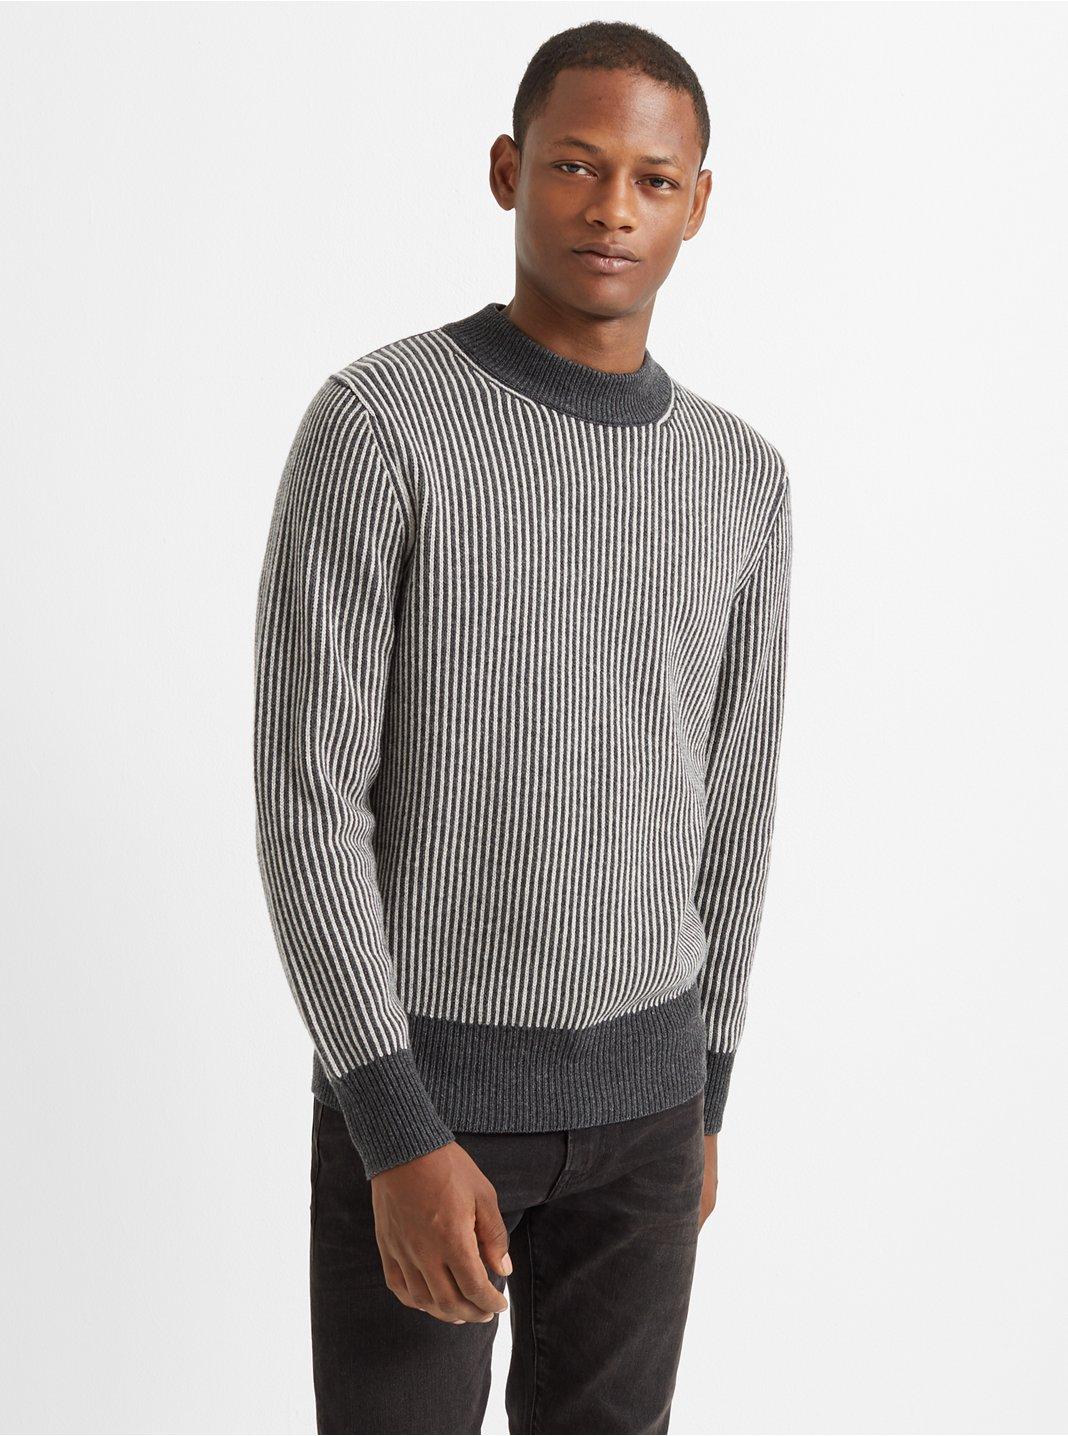 Cashmere Novelty Rib Sweater